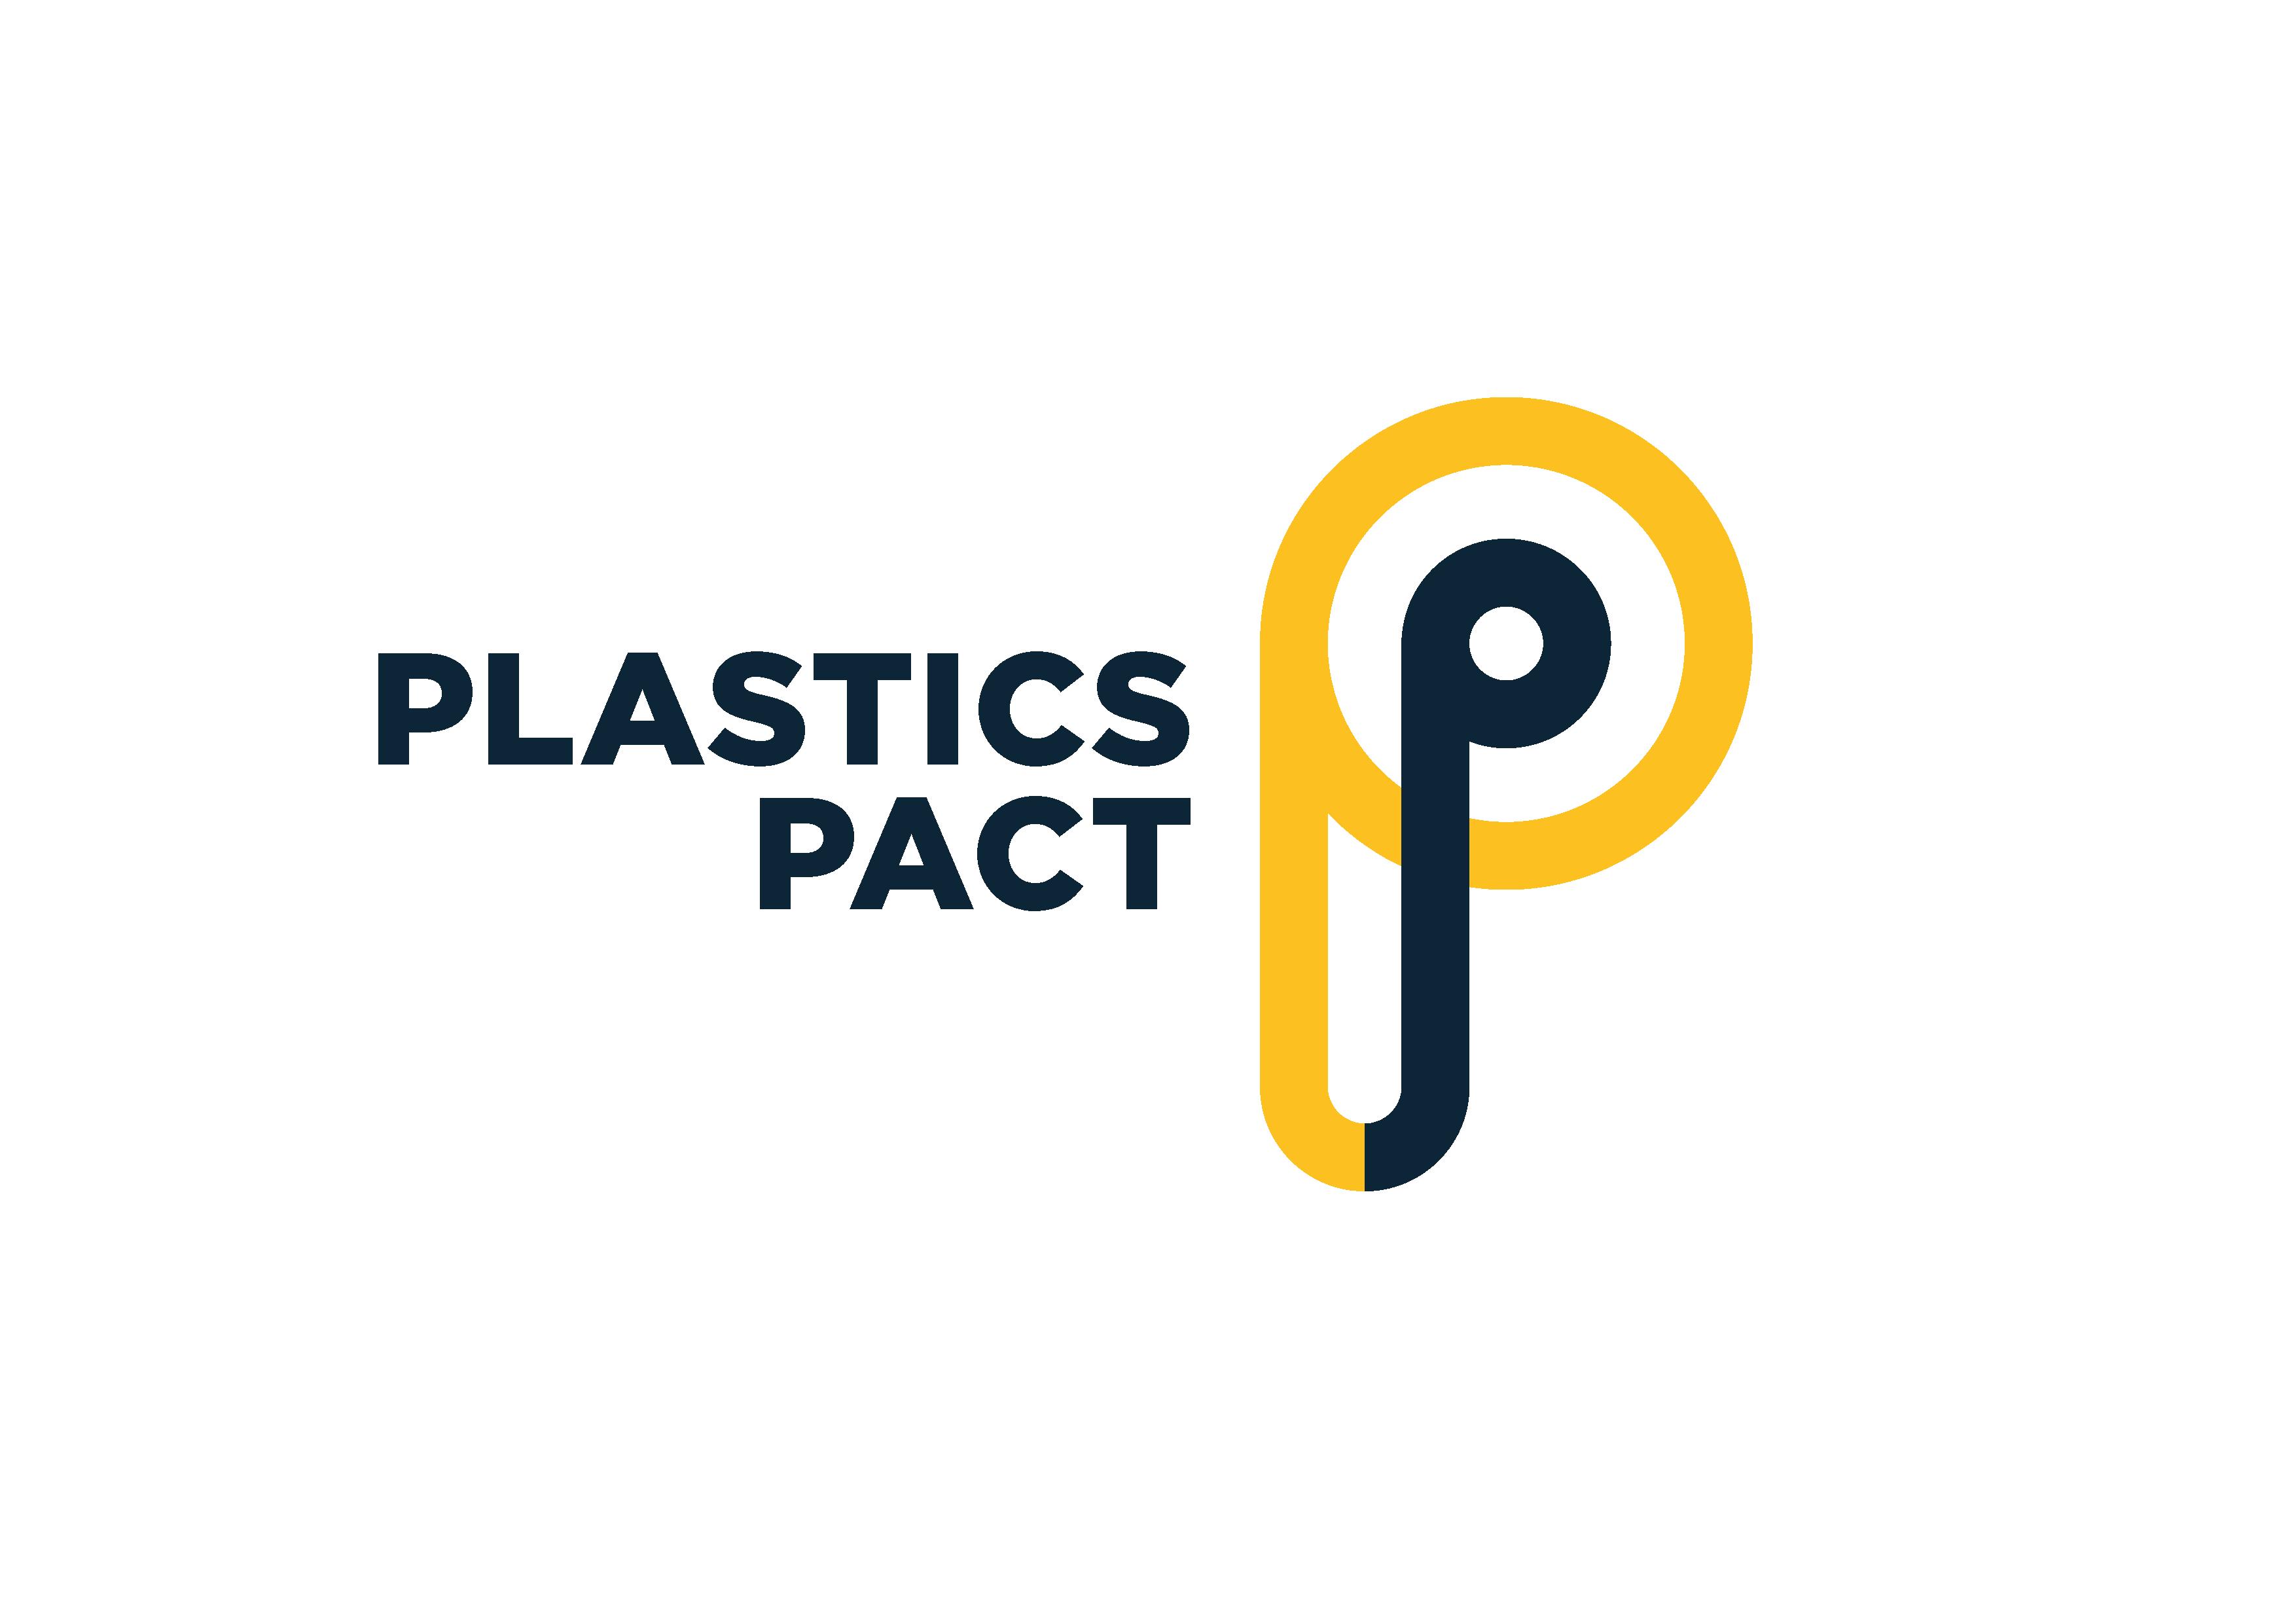 https://europeanplasticspact.org/wp-content/uploads/2020/03/Ellen-MacArthur-Foundation.png